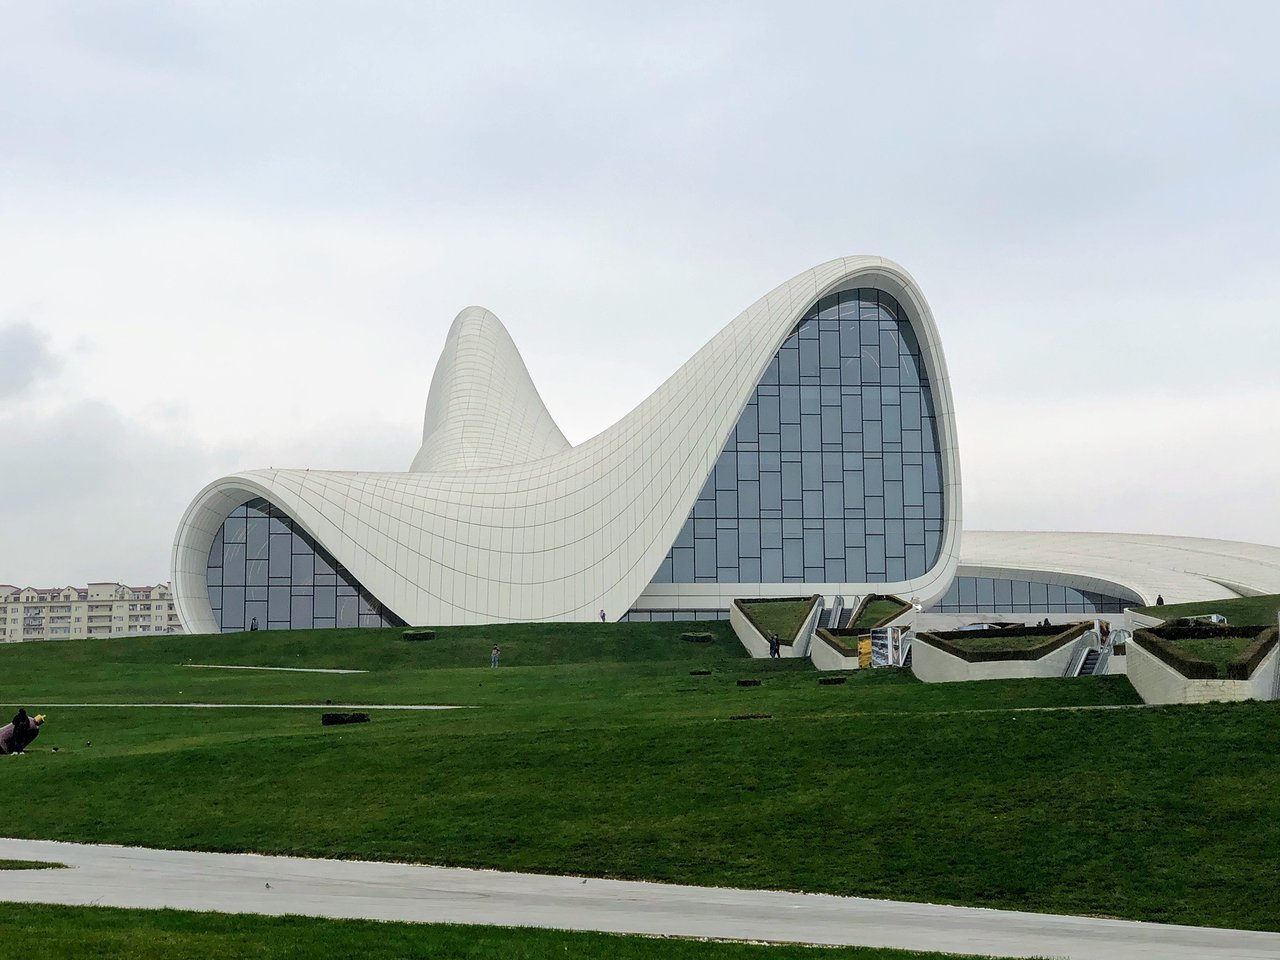 Heydar Aliyev Cultural Center Baku 2020 All You Need to